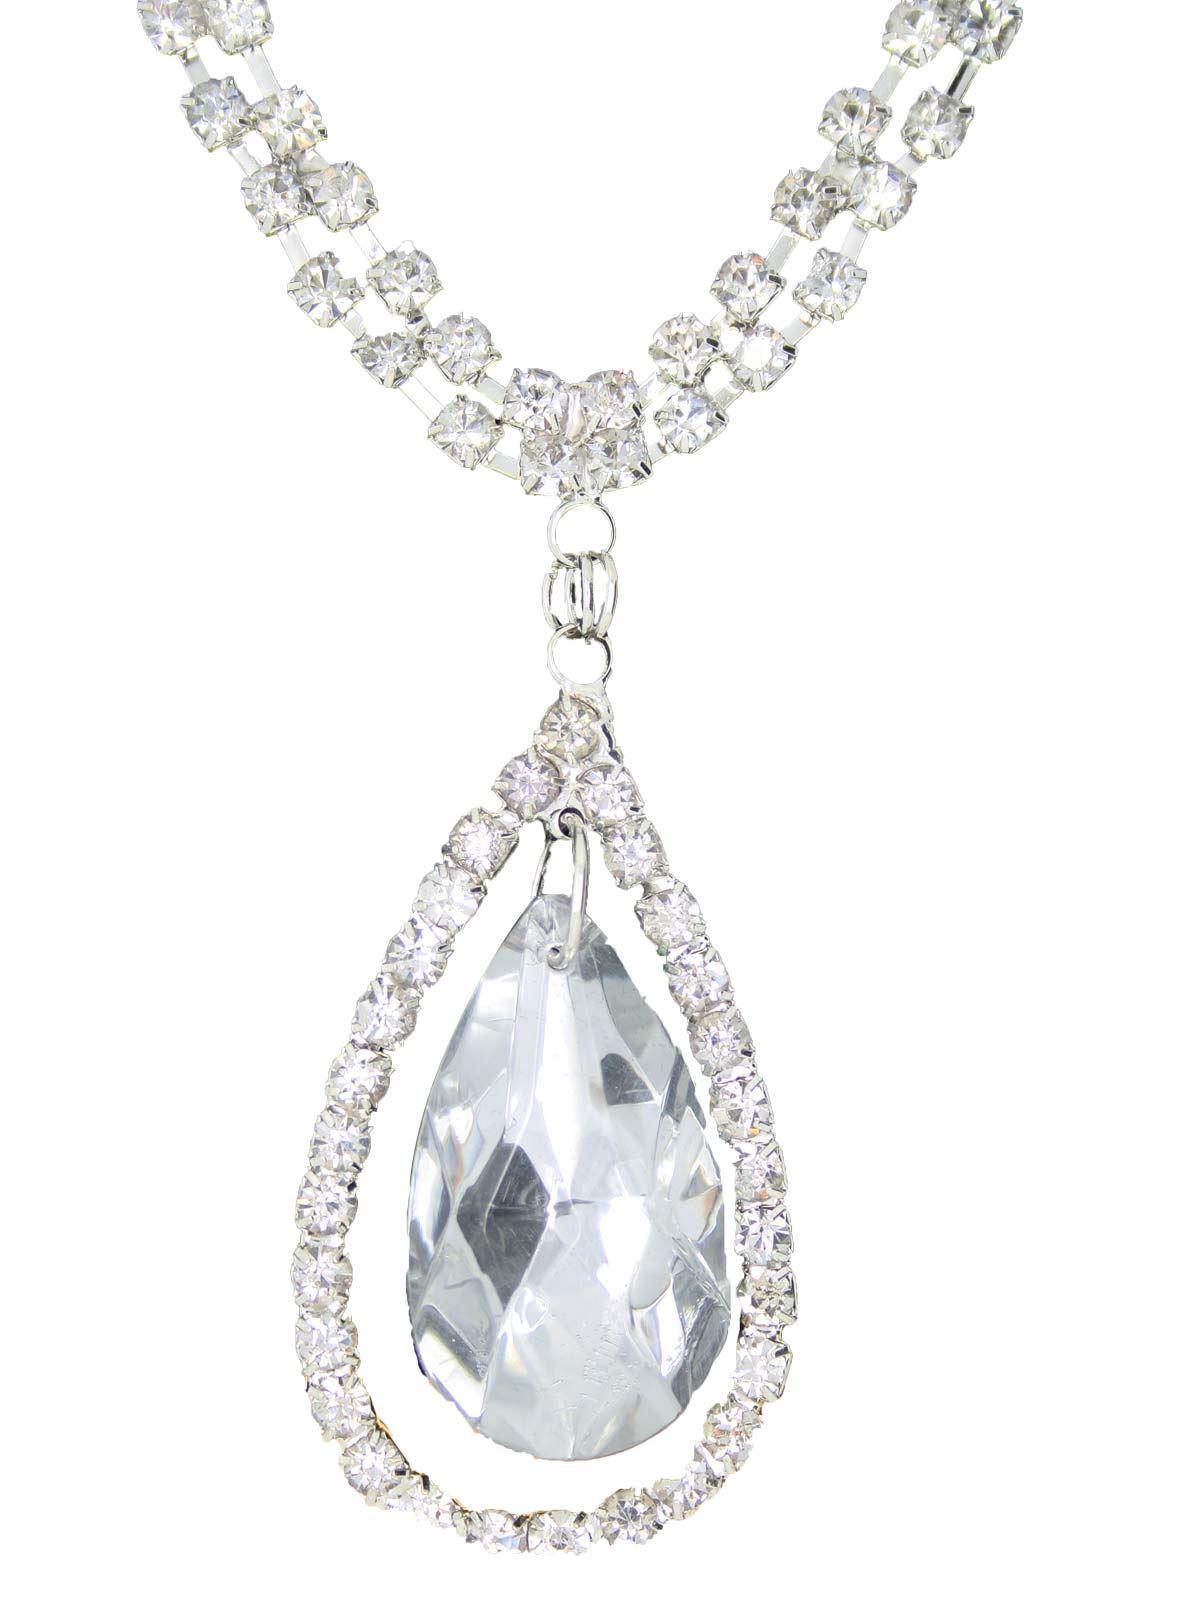 True-Face-Ladies-Women-039-s-Elegant-Earrings-Necklace-Set-Metal-Alloy-Jewellery thumbnail 48